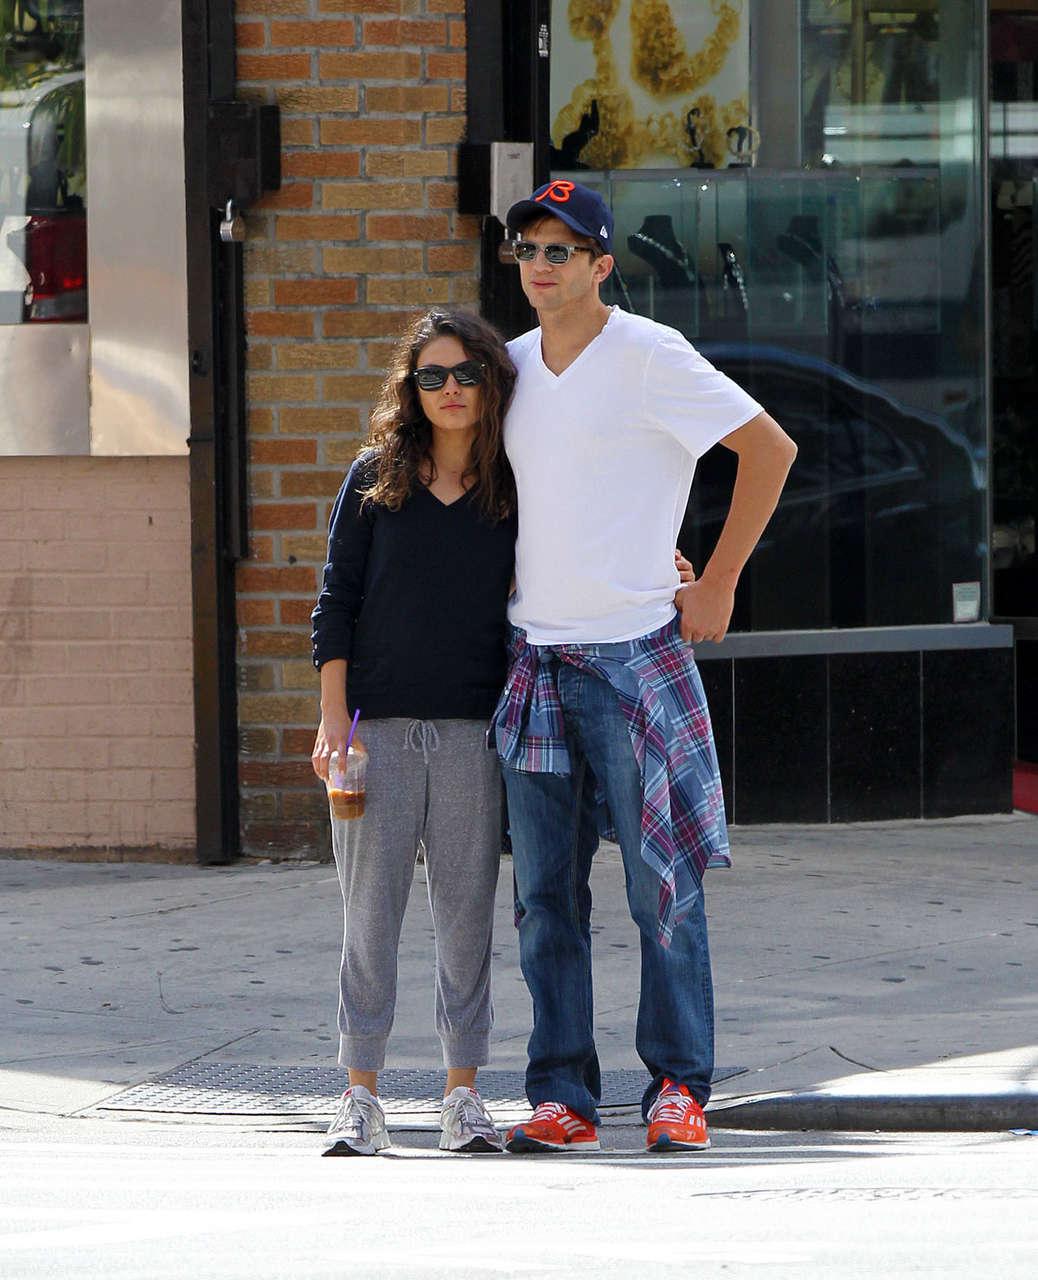 Mila Kunis Ashton Kutcher Out Nad About New York